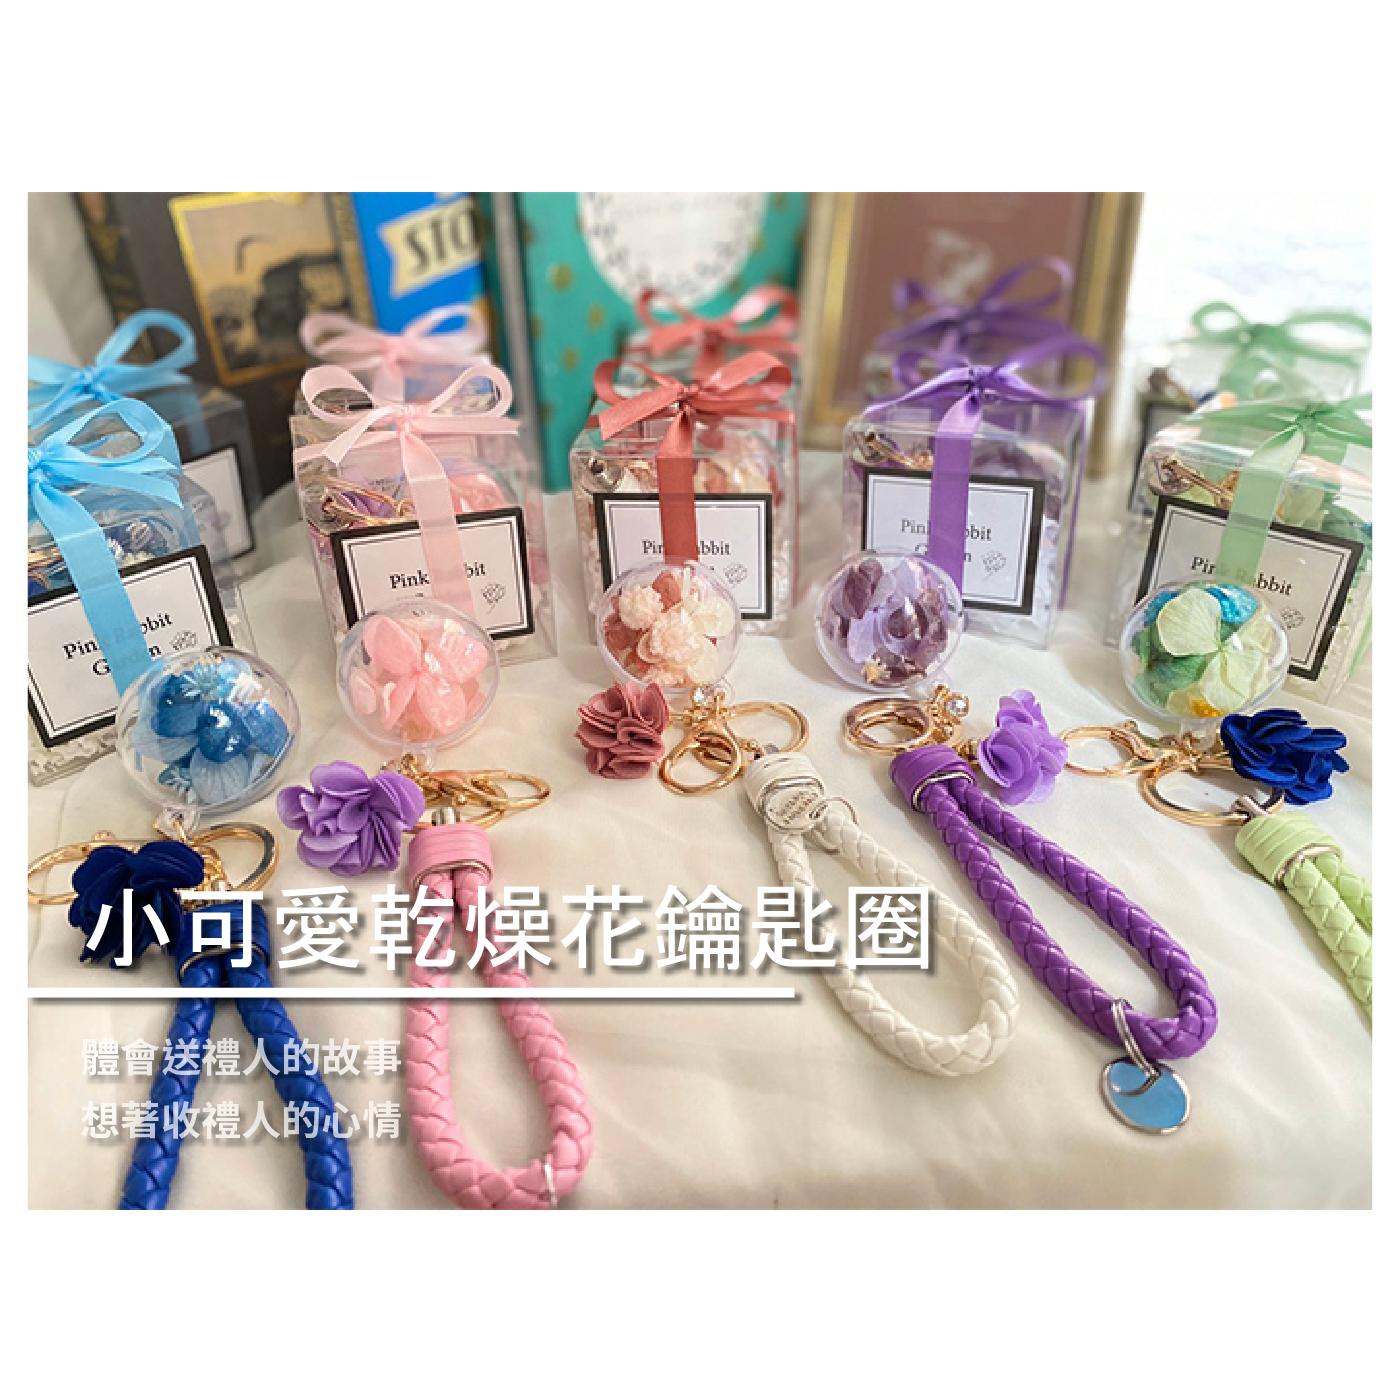 【Pink Rabbit Garden】『PRG永生花/乾燥花』小可愛乾燥花鑰匙圈 / 花草 / 園藝